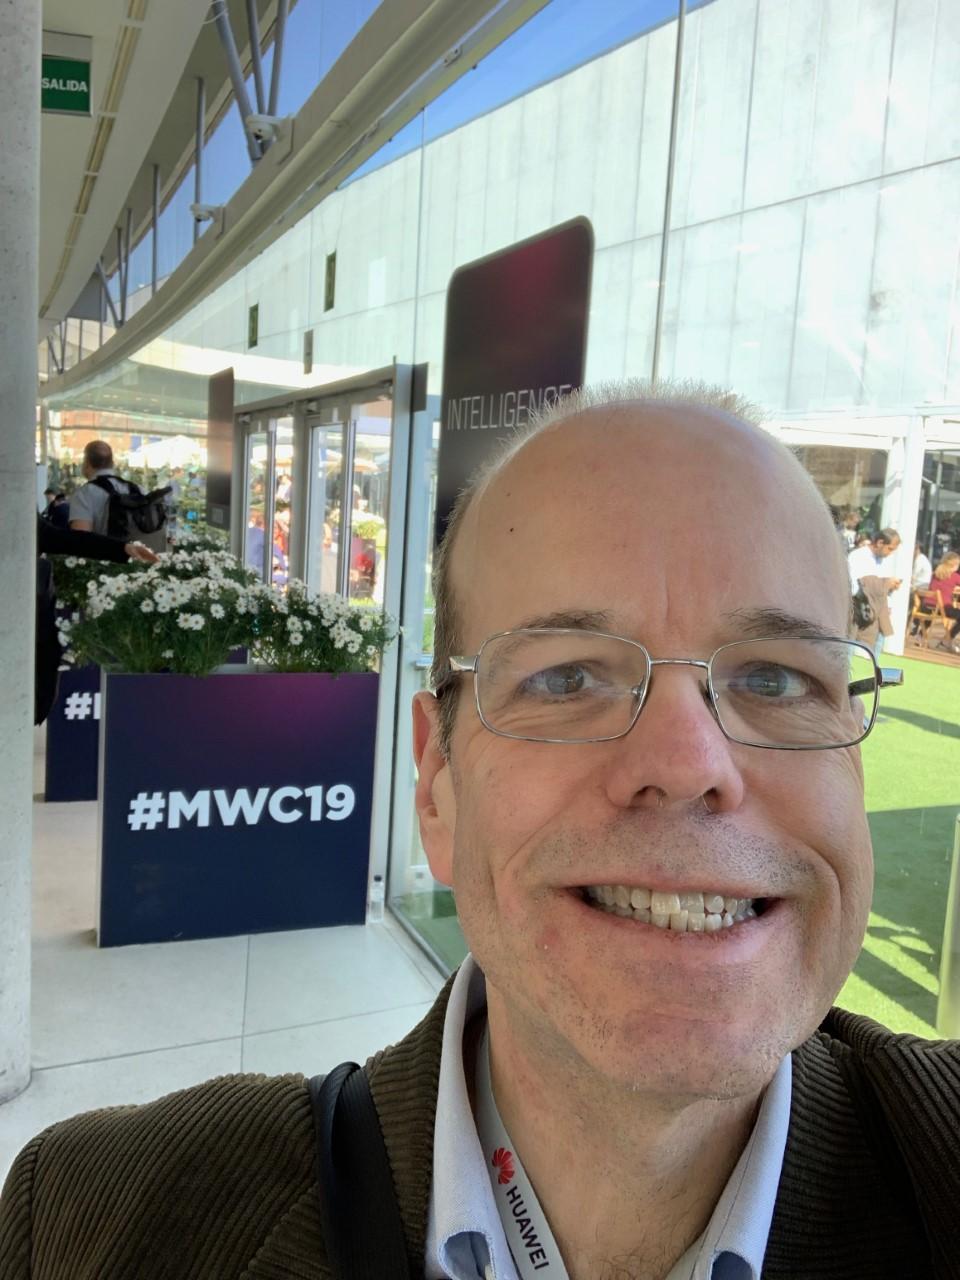 Mitch Wagner